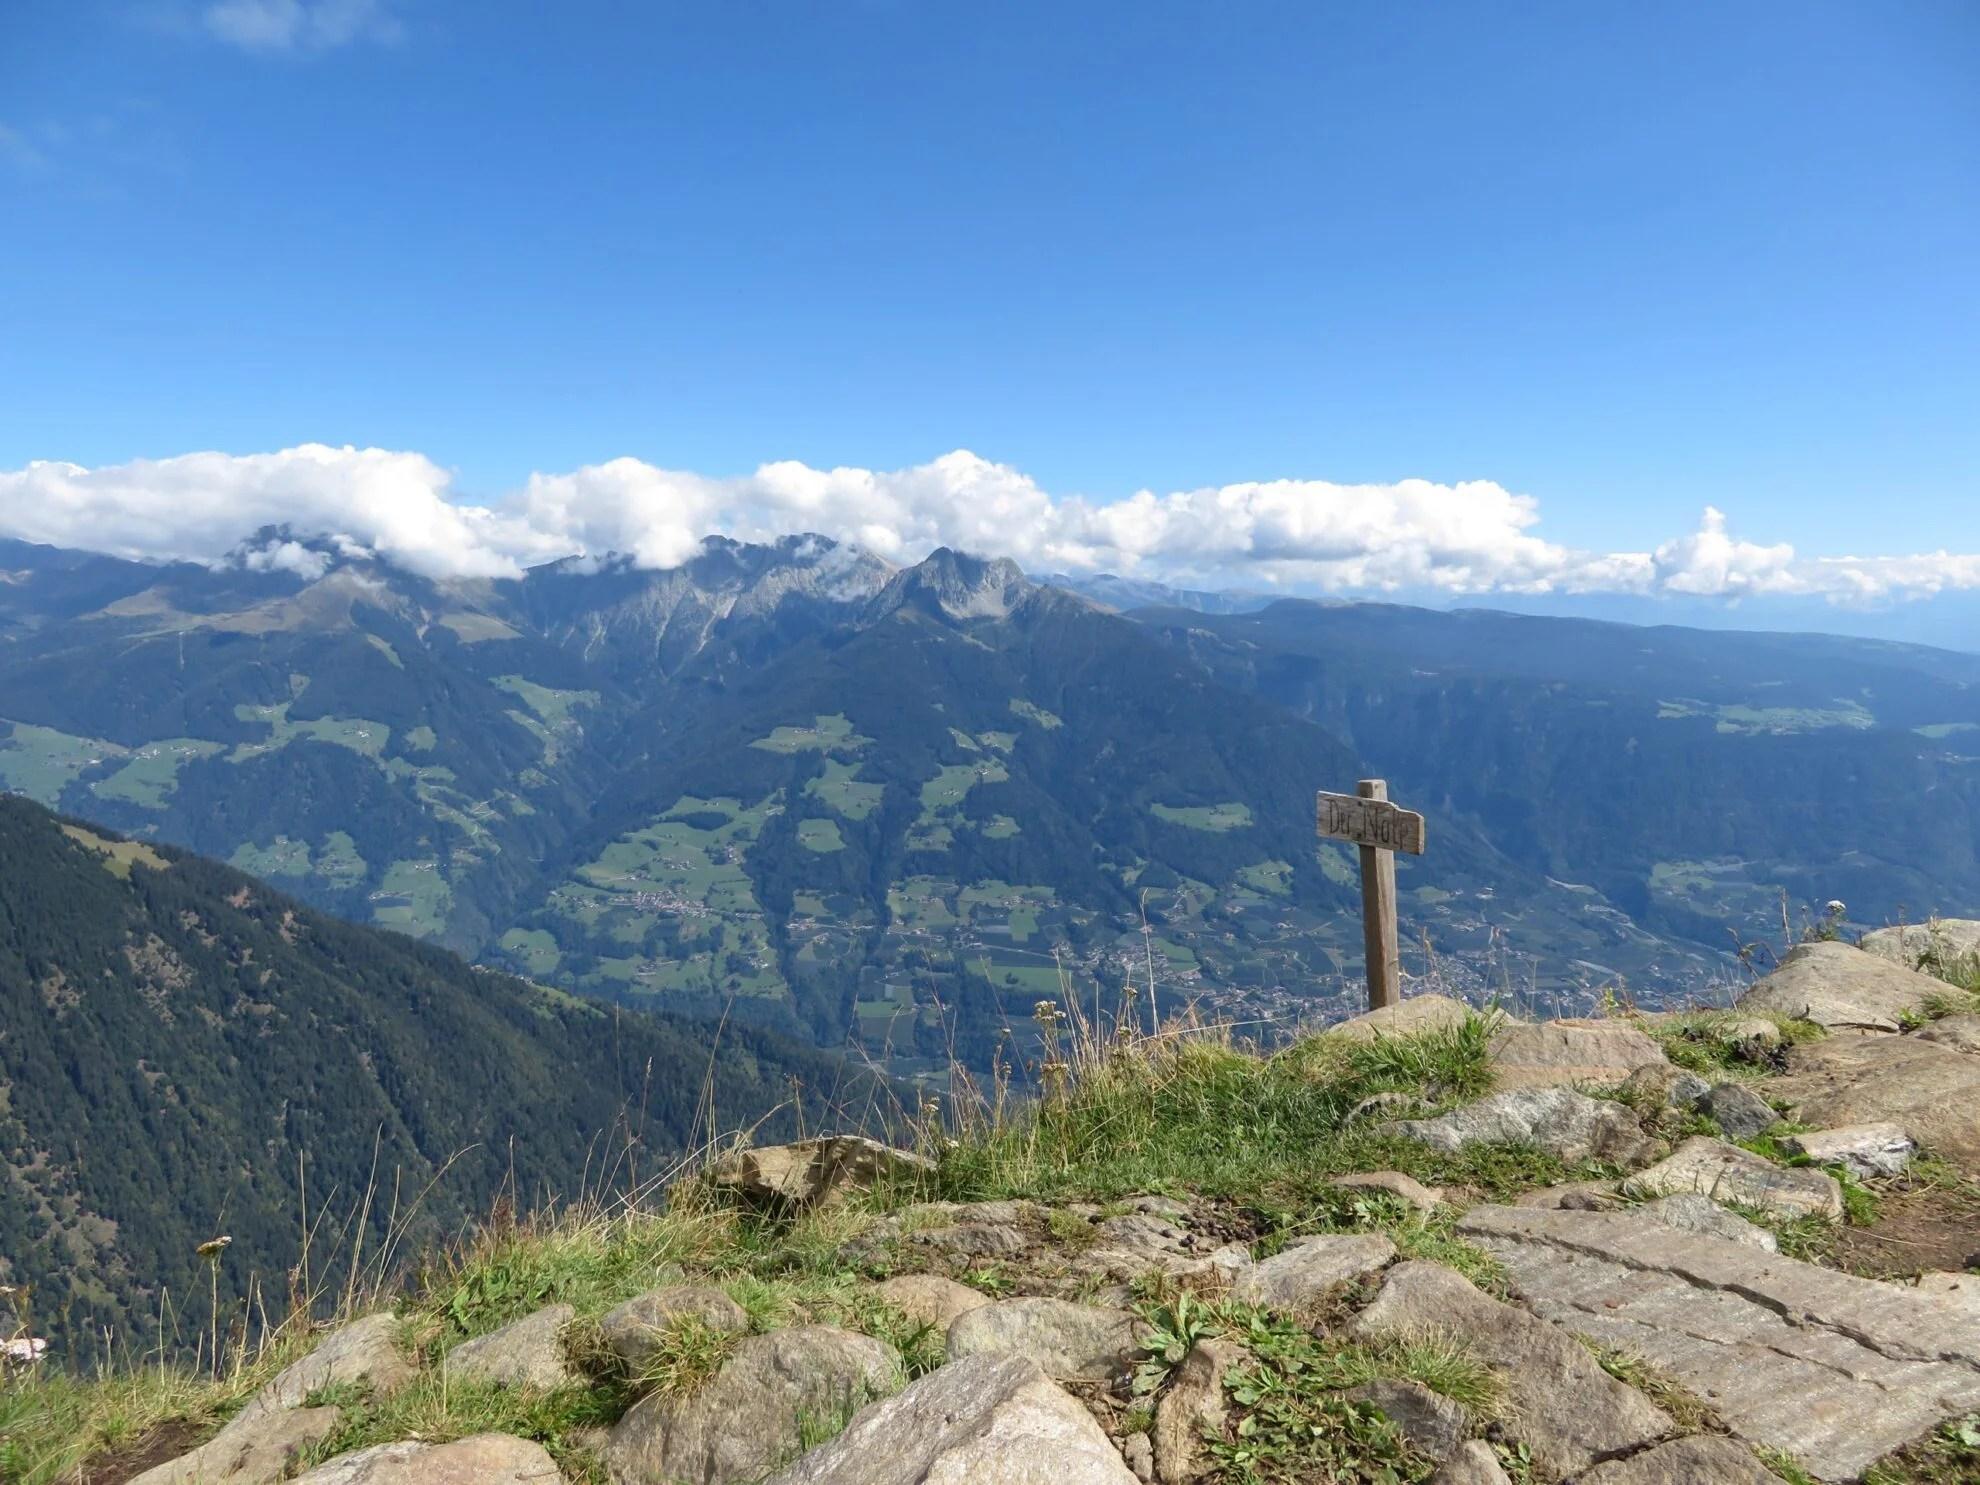 Der Nopf | Mutspitze | Dorf Tirol | Wandelen in Zuid Tirol